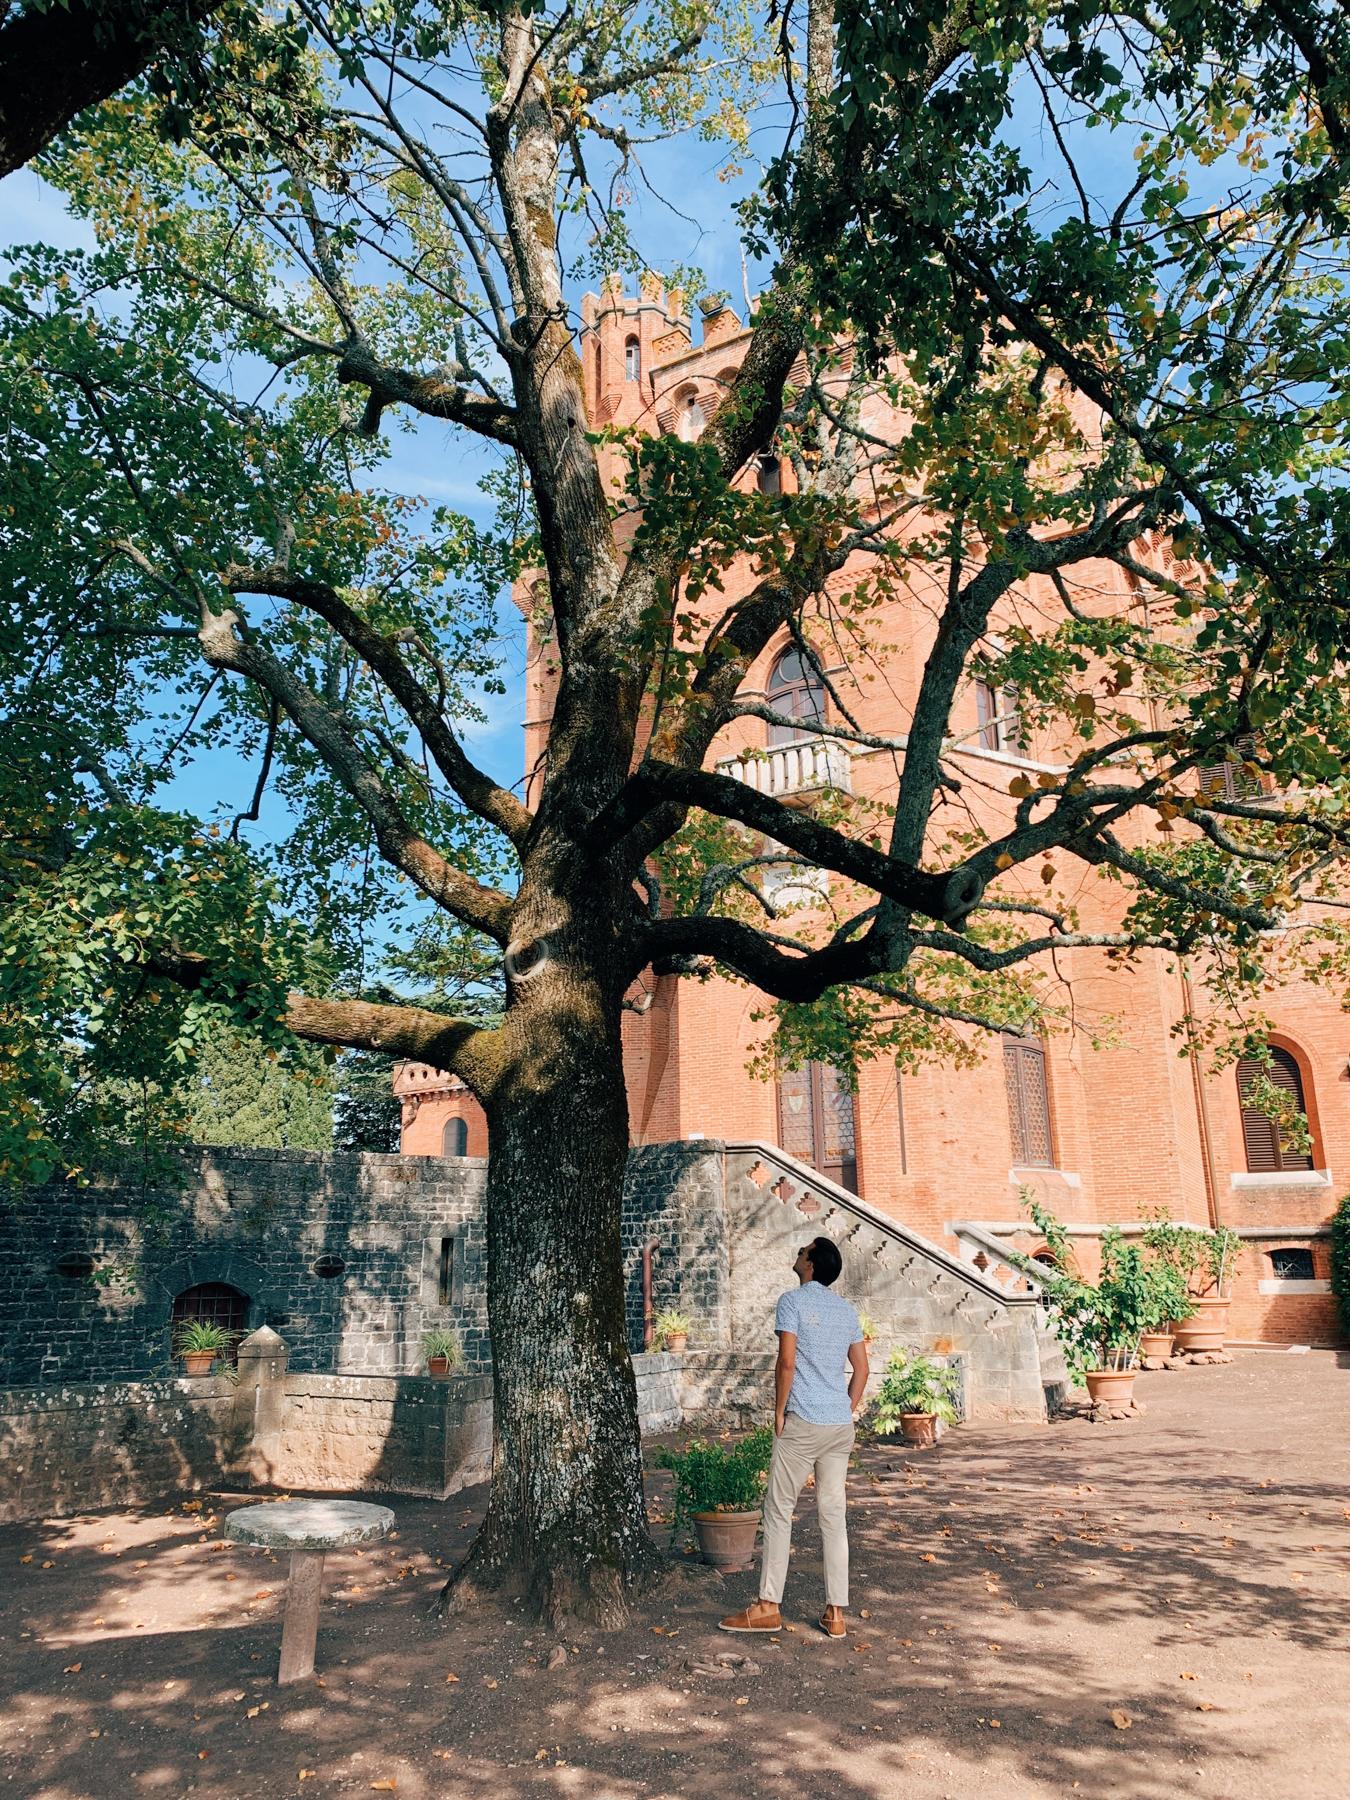 Outside the beautiful grounds at Castello di Brolio.